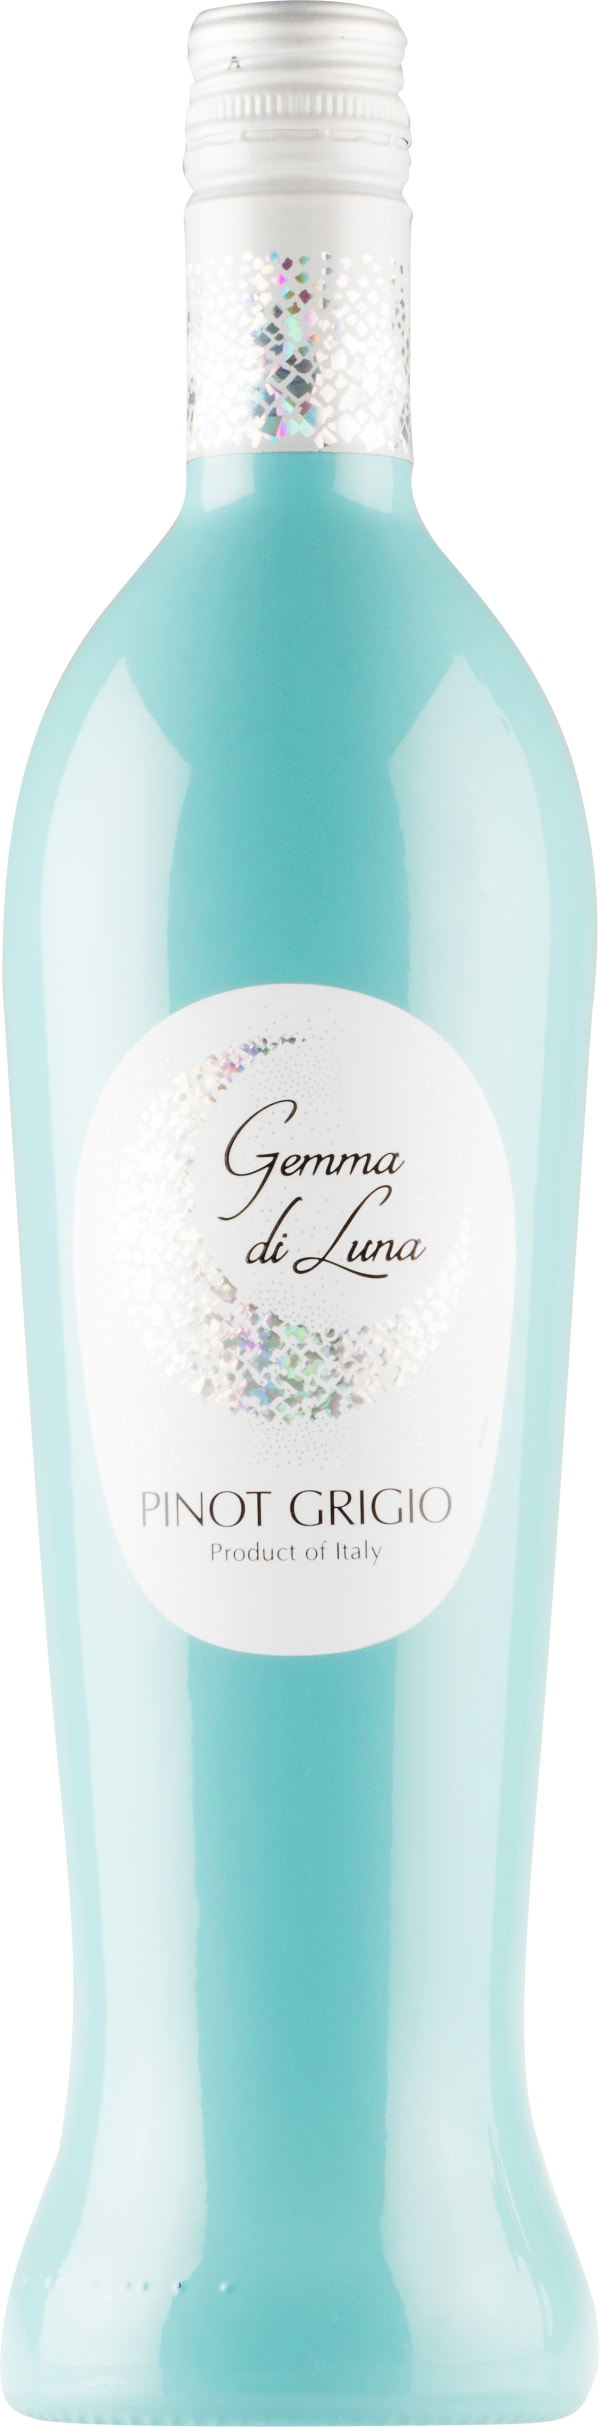 Gemma di Luna Pinot Grigio 2018